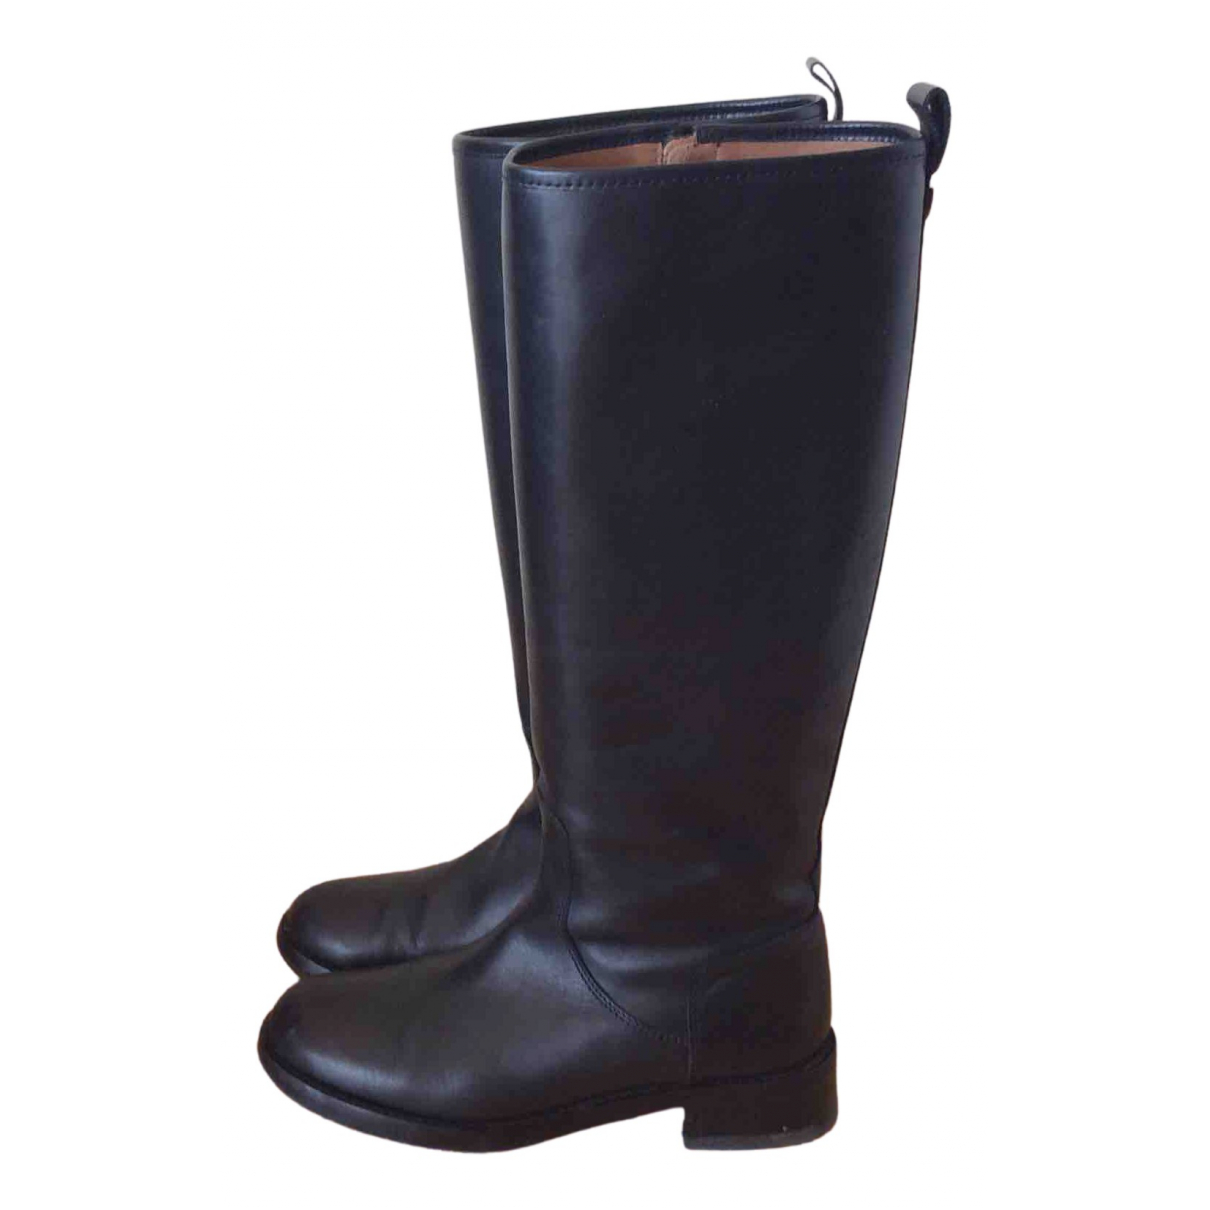 Massimo Dutti N Black Leather Boots for Women 37 EU